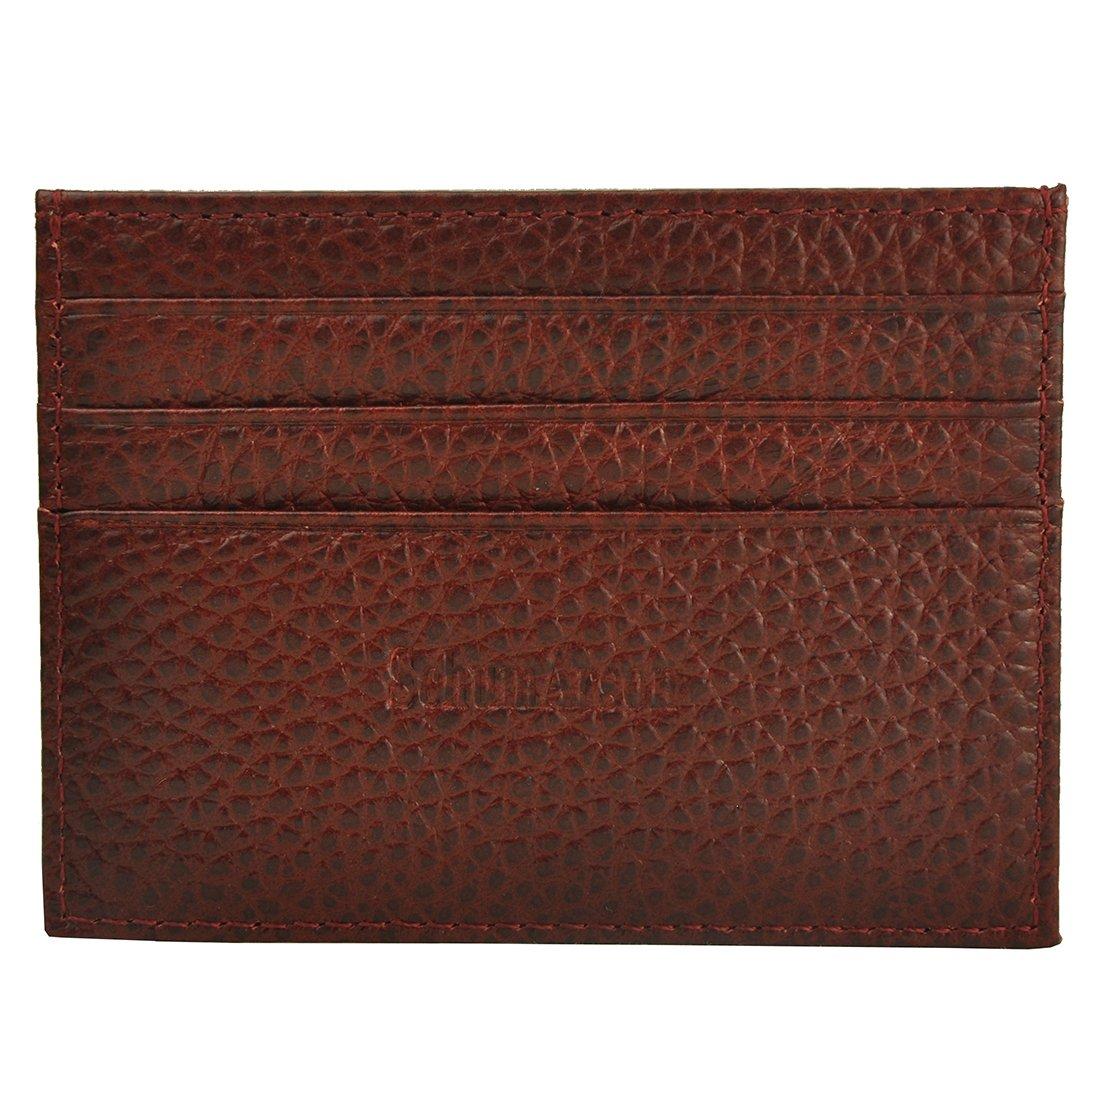 Schumarson Genuine Leather RFID Blocking Card Case Slim Card Holder Red Front Pocket Wallet for Women and Men Red